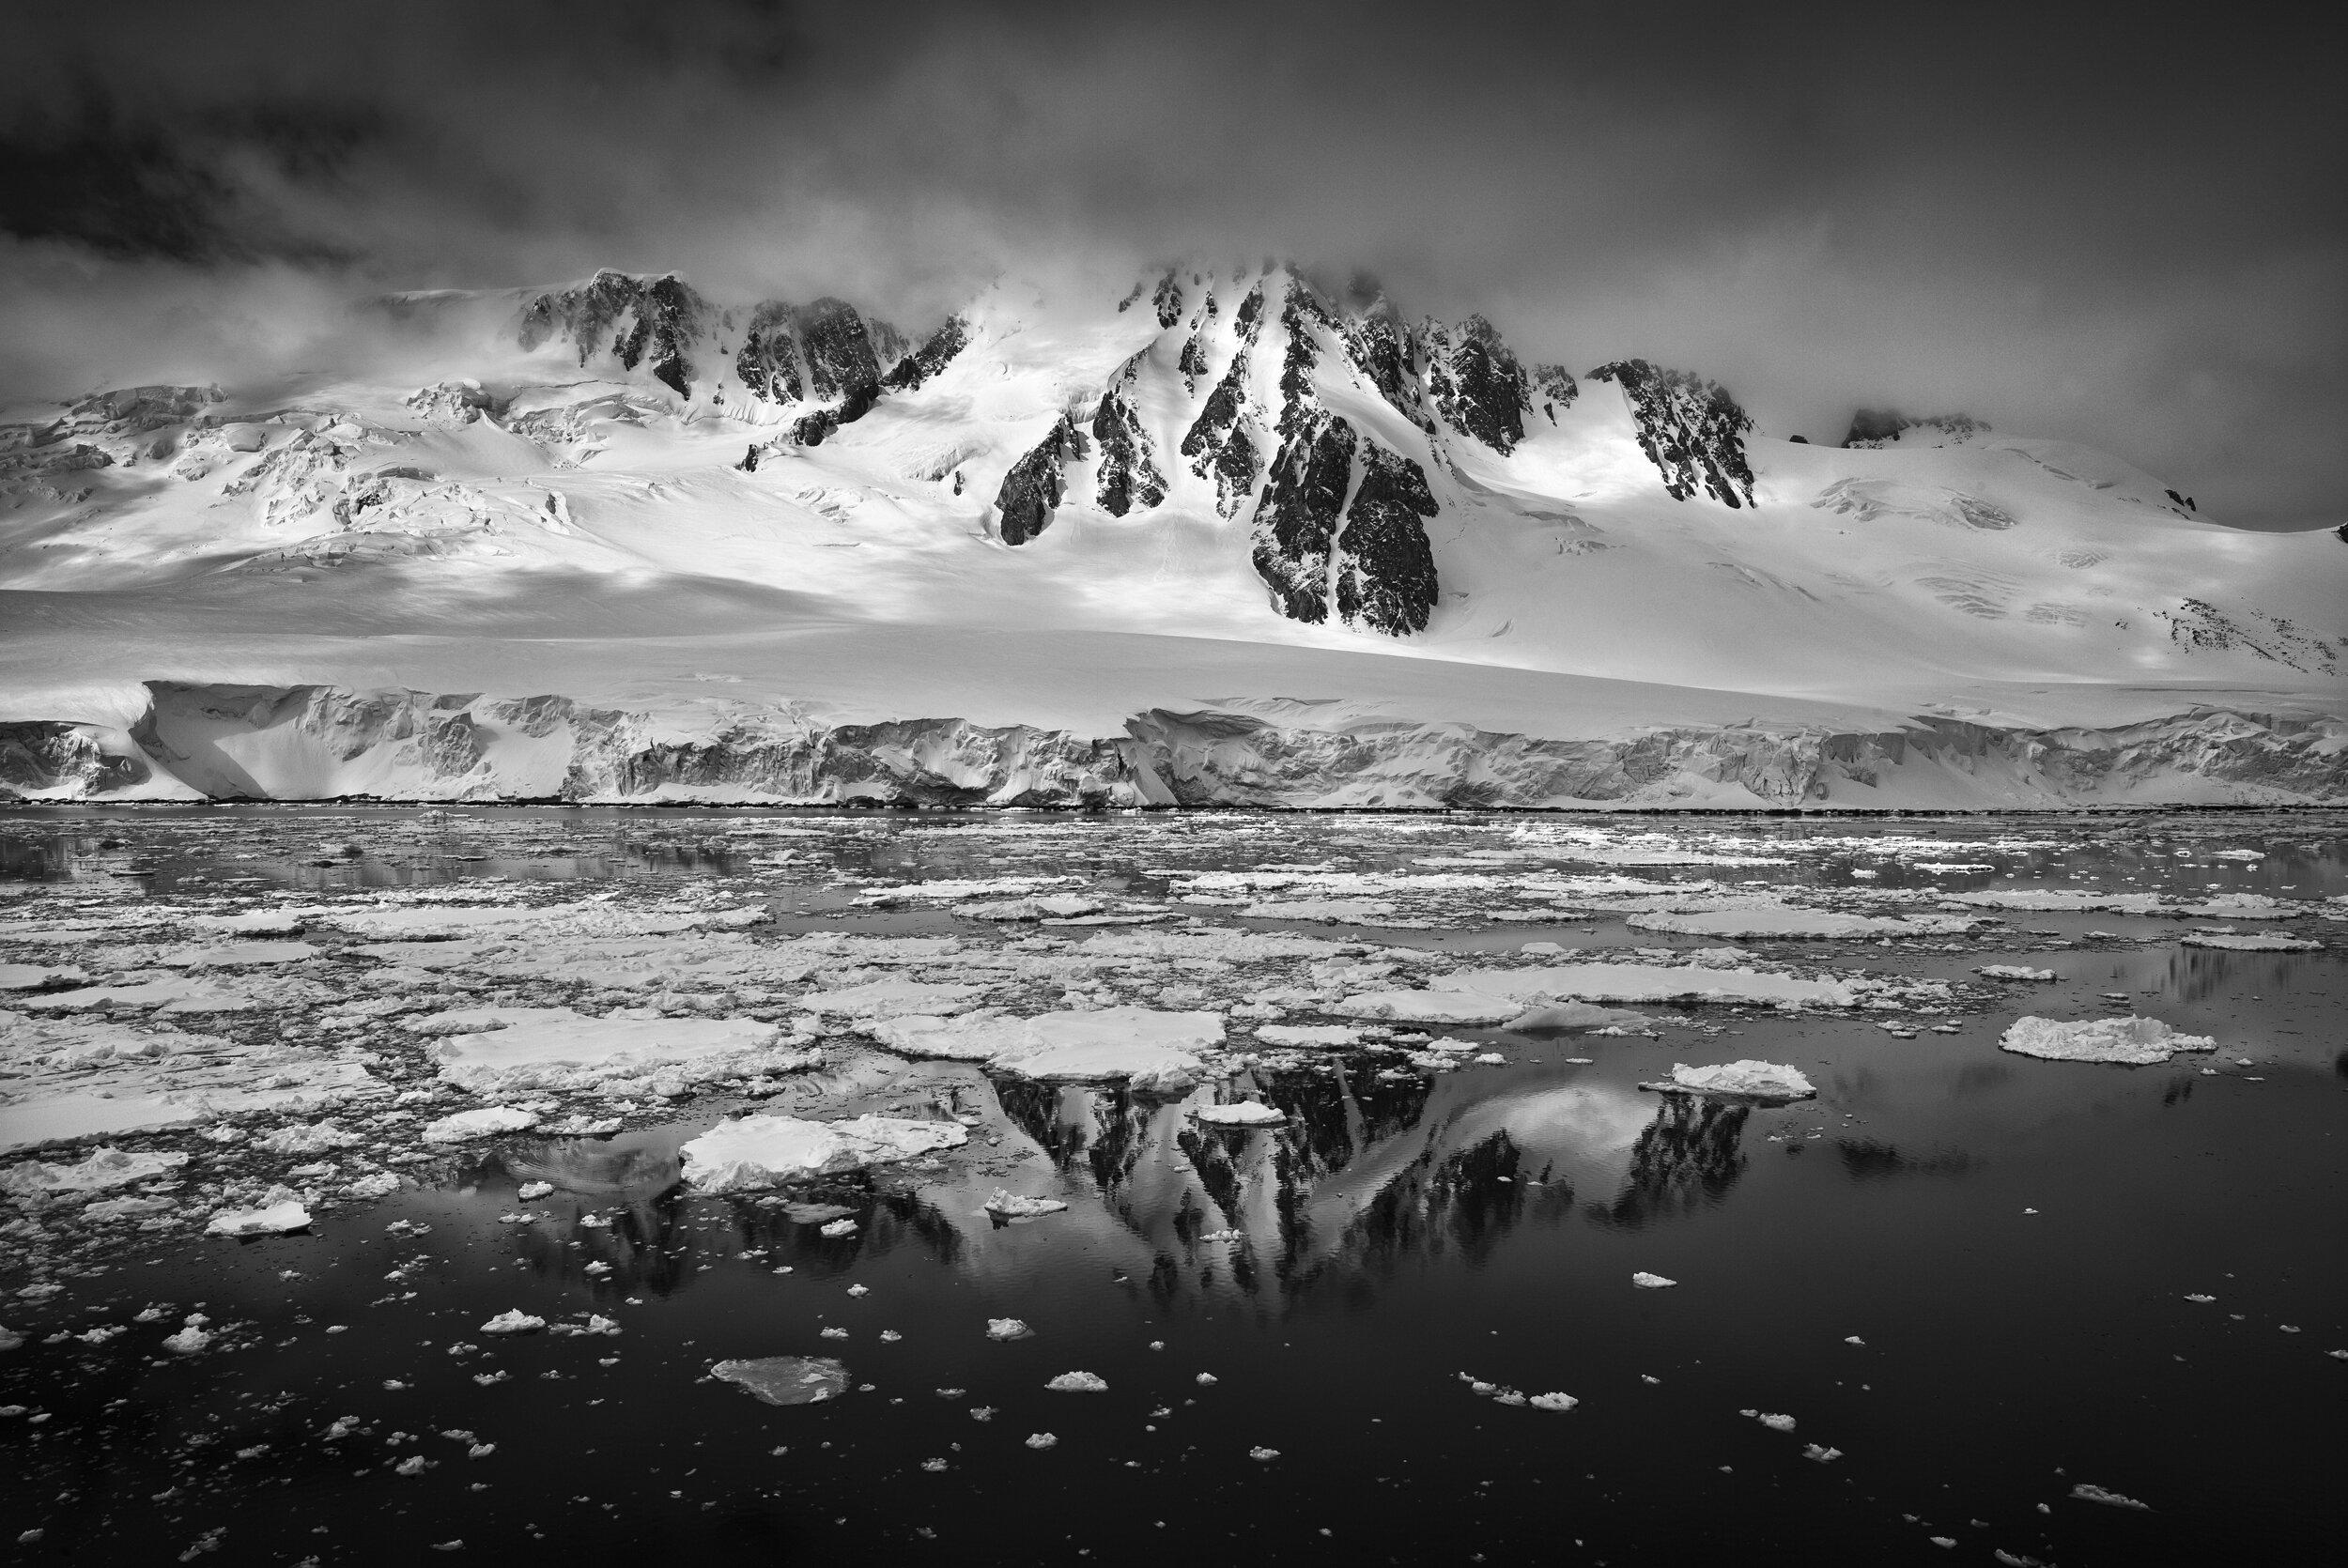 manuel_uebler_antarctica_bw_016.jpg